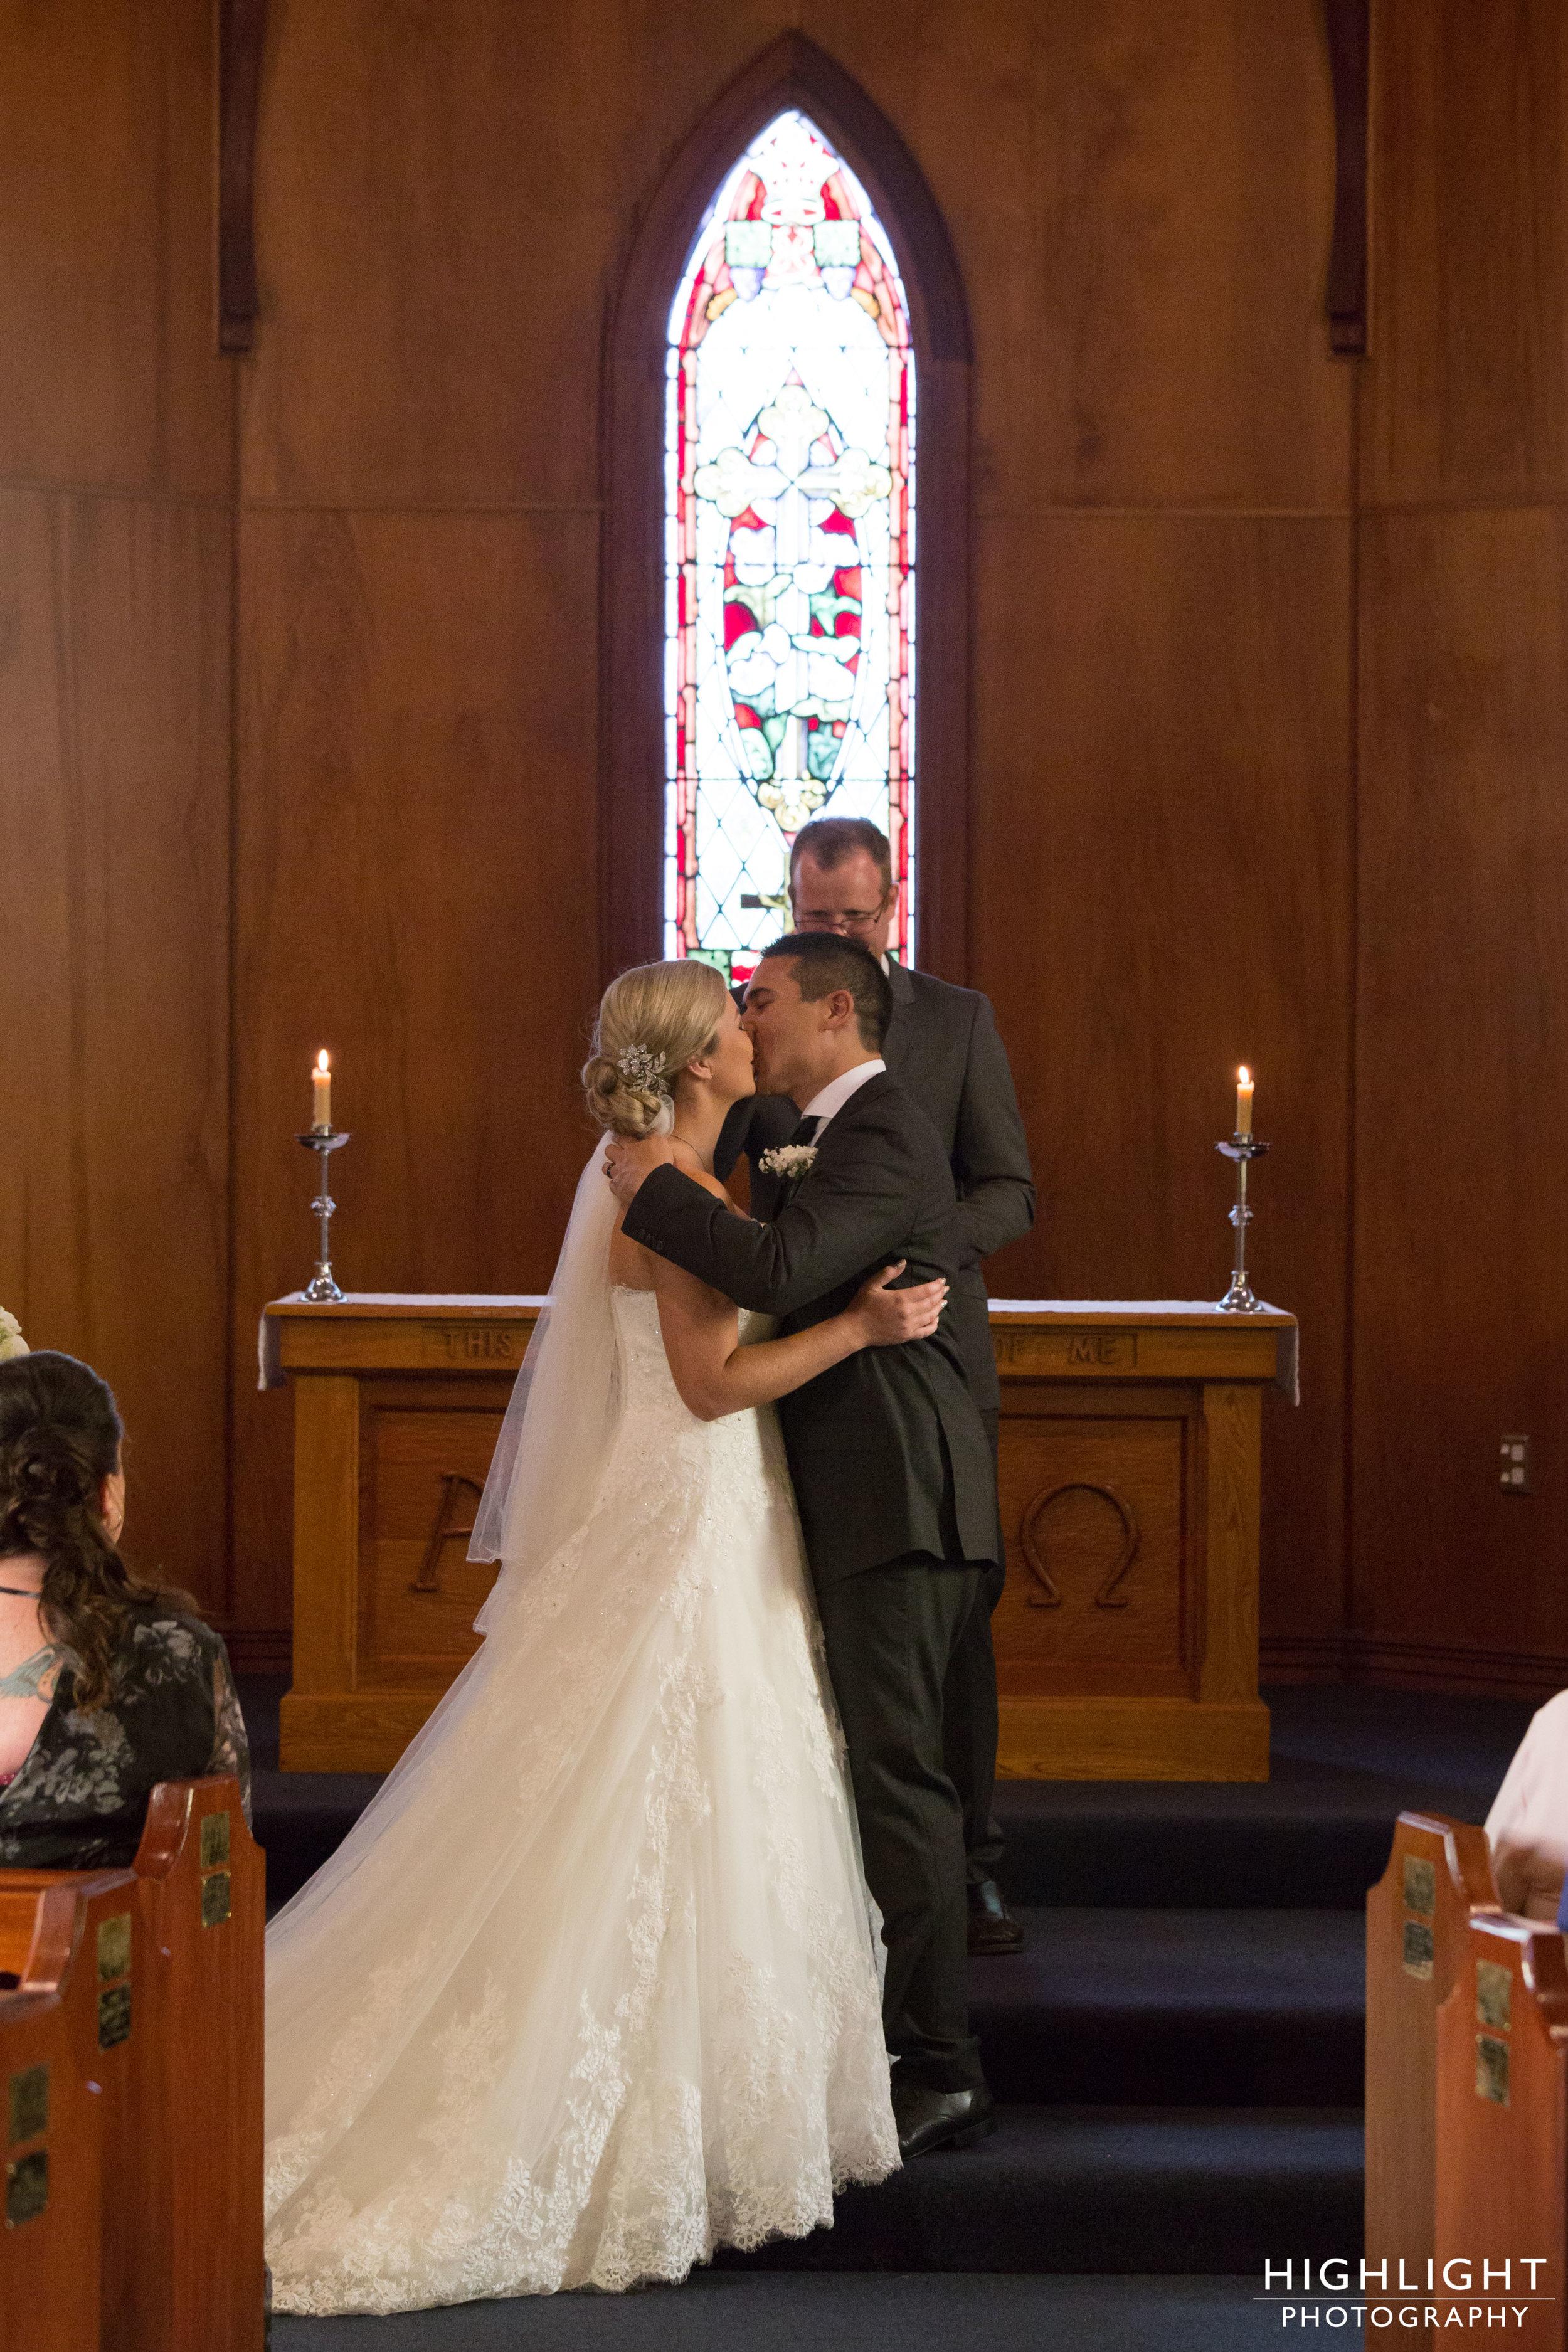 hannah-dan-highlight-wedding-photography-palmerston-north-40.jpg